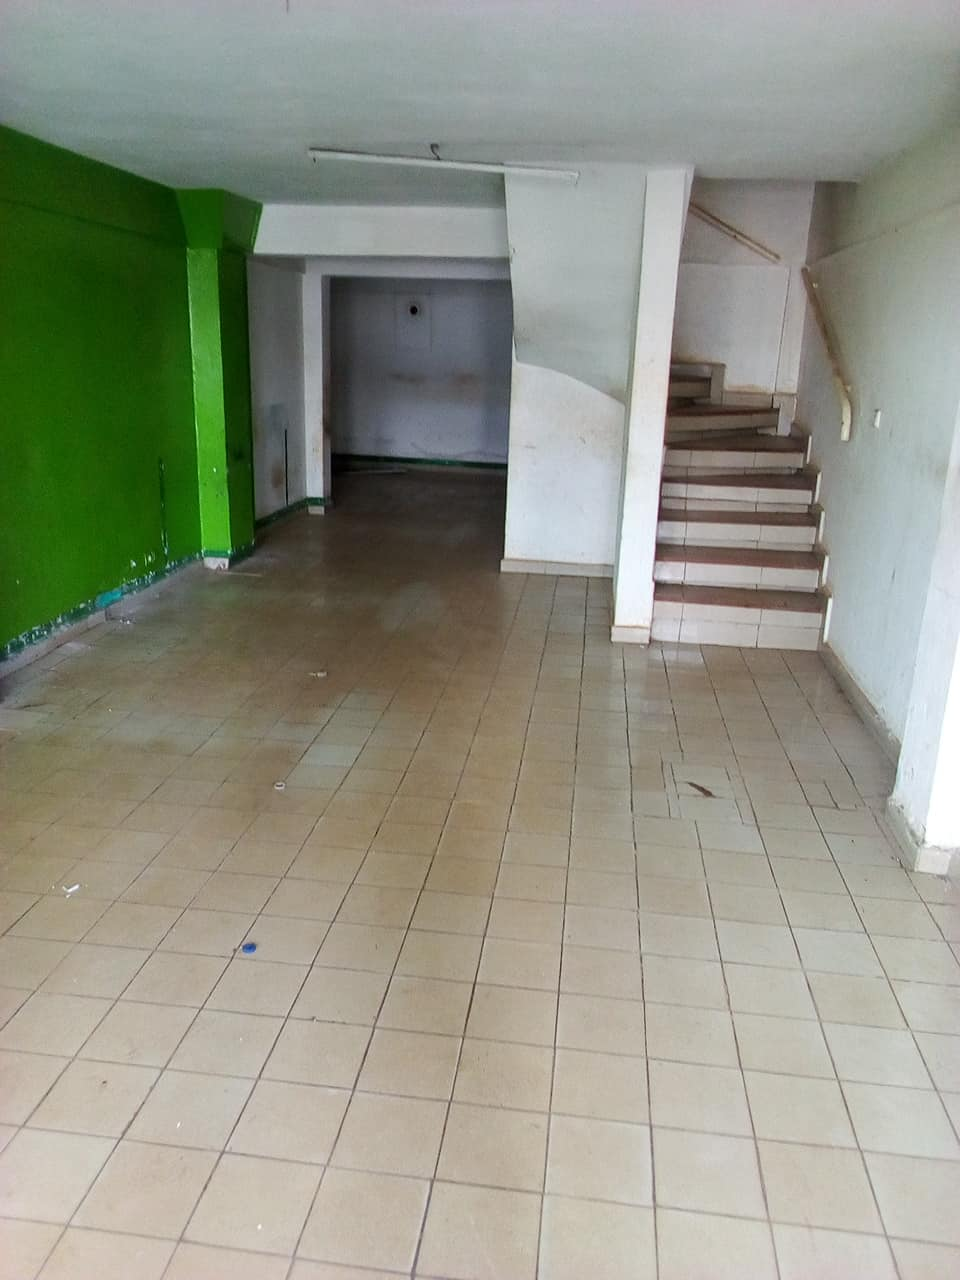 Shop to rent at Yaoundé, Tsinga, apres super marche max - 60 m2 - 350 000 FCFA